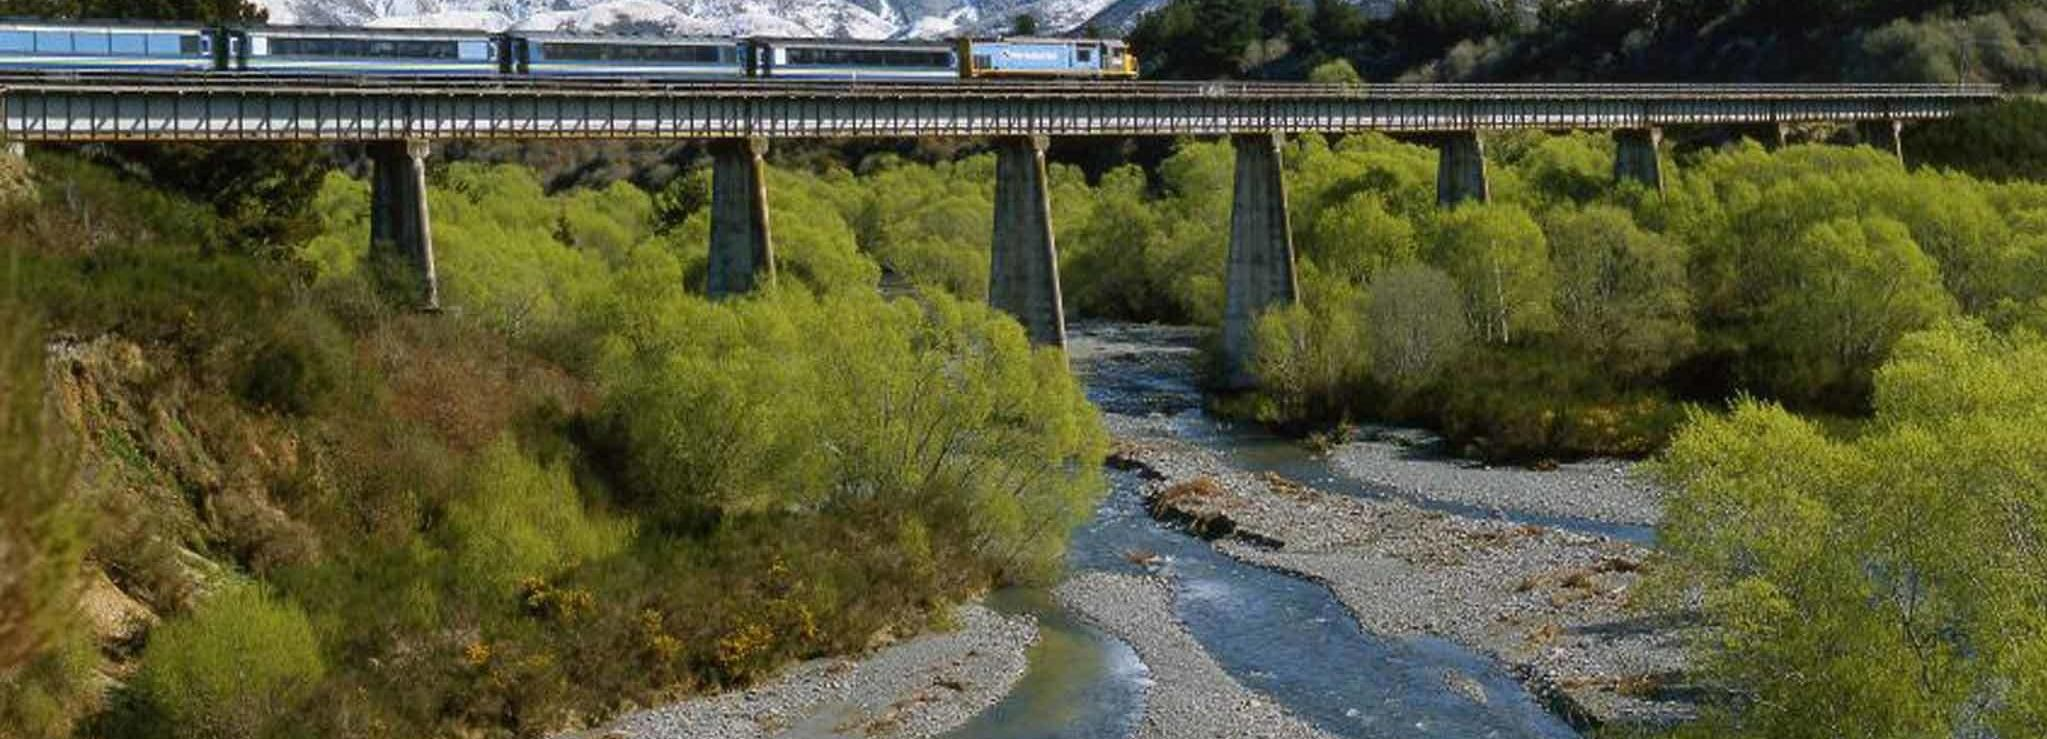 Vanuit Christchurch: Arthur's Pass met TranzAlpine-trein